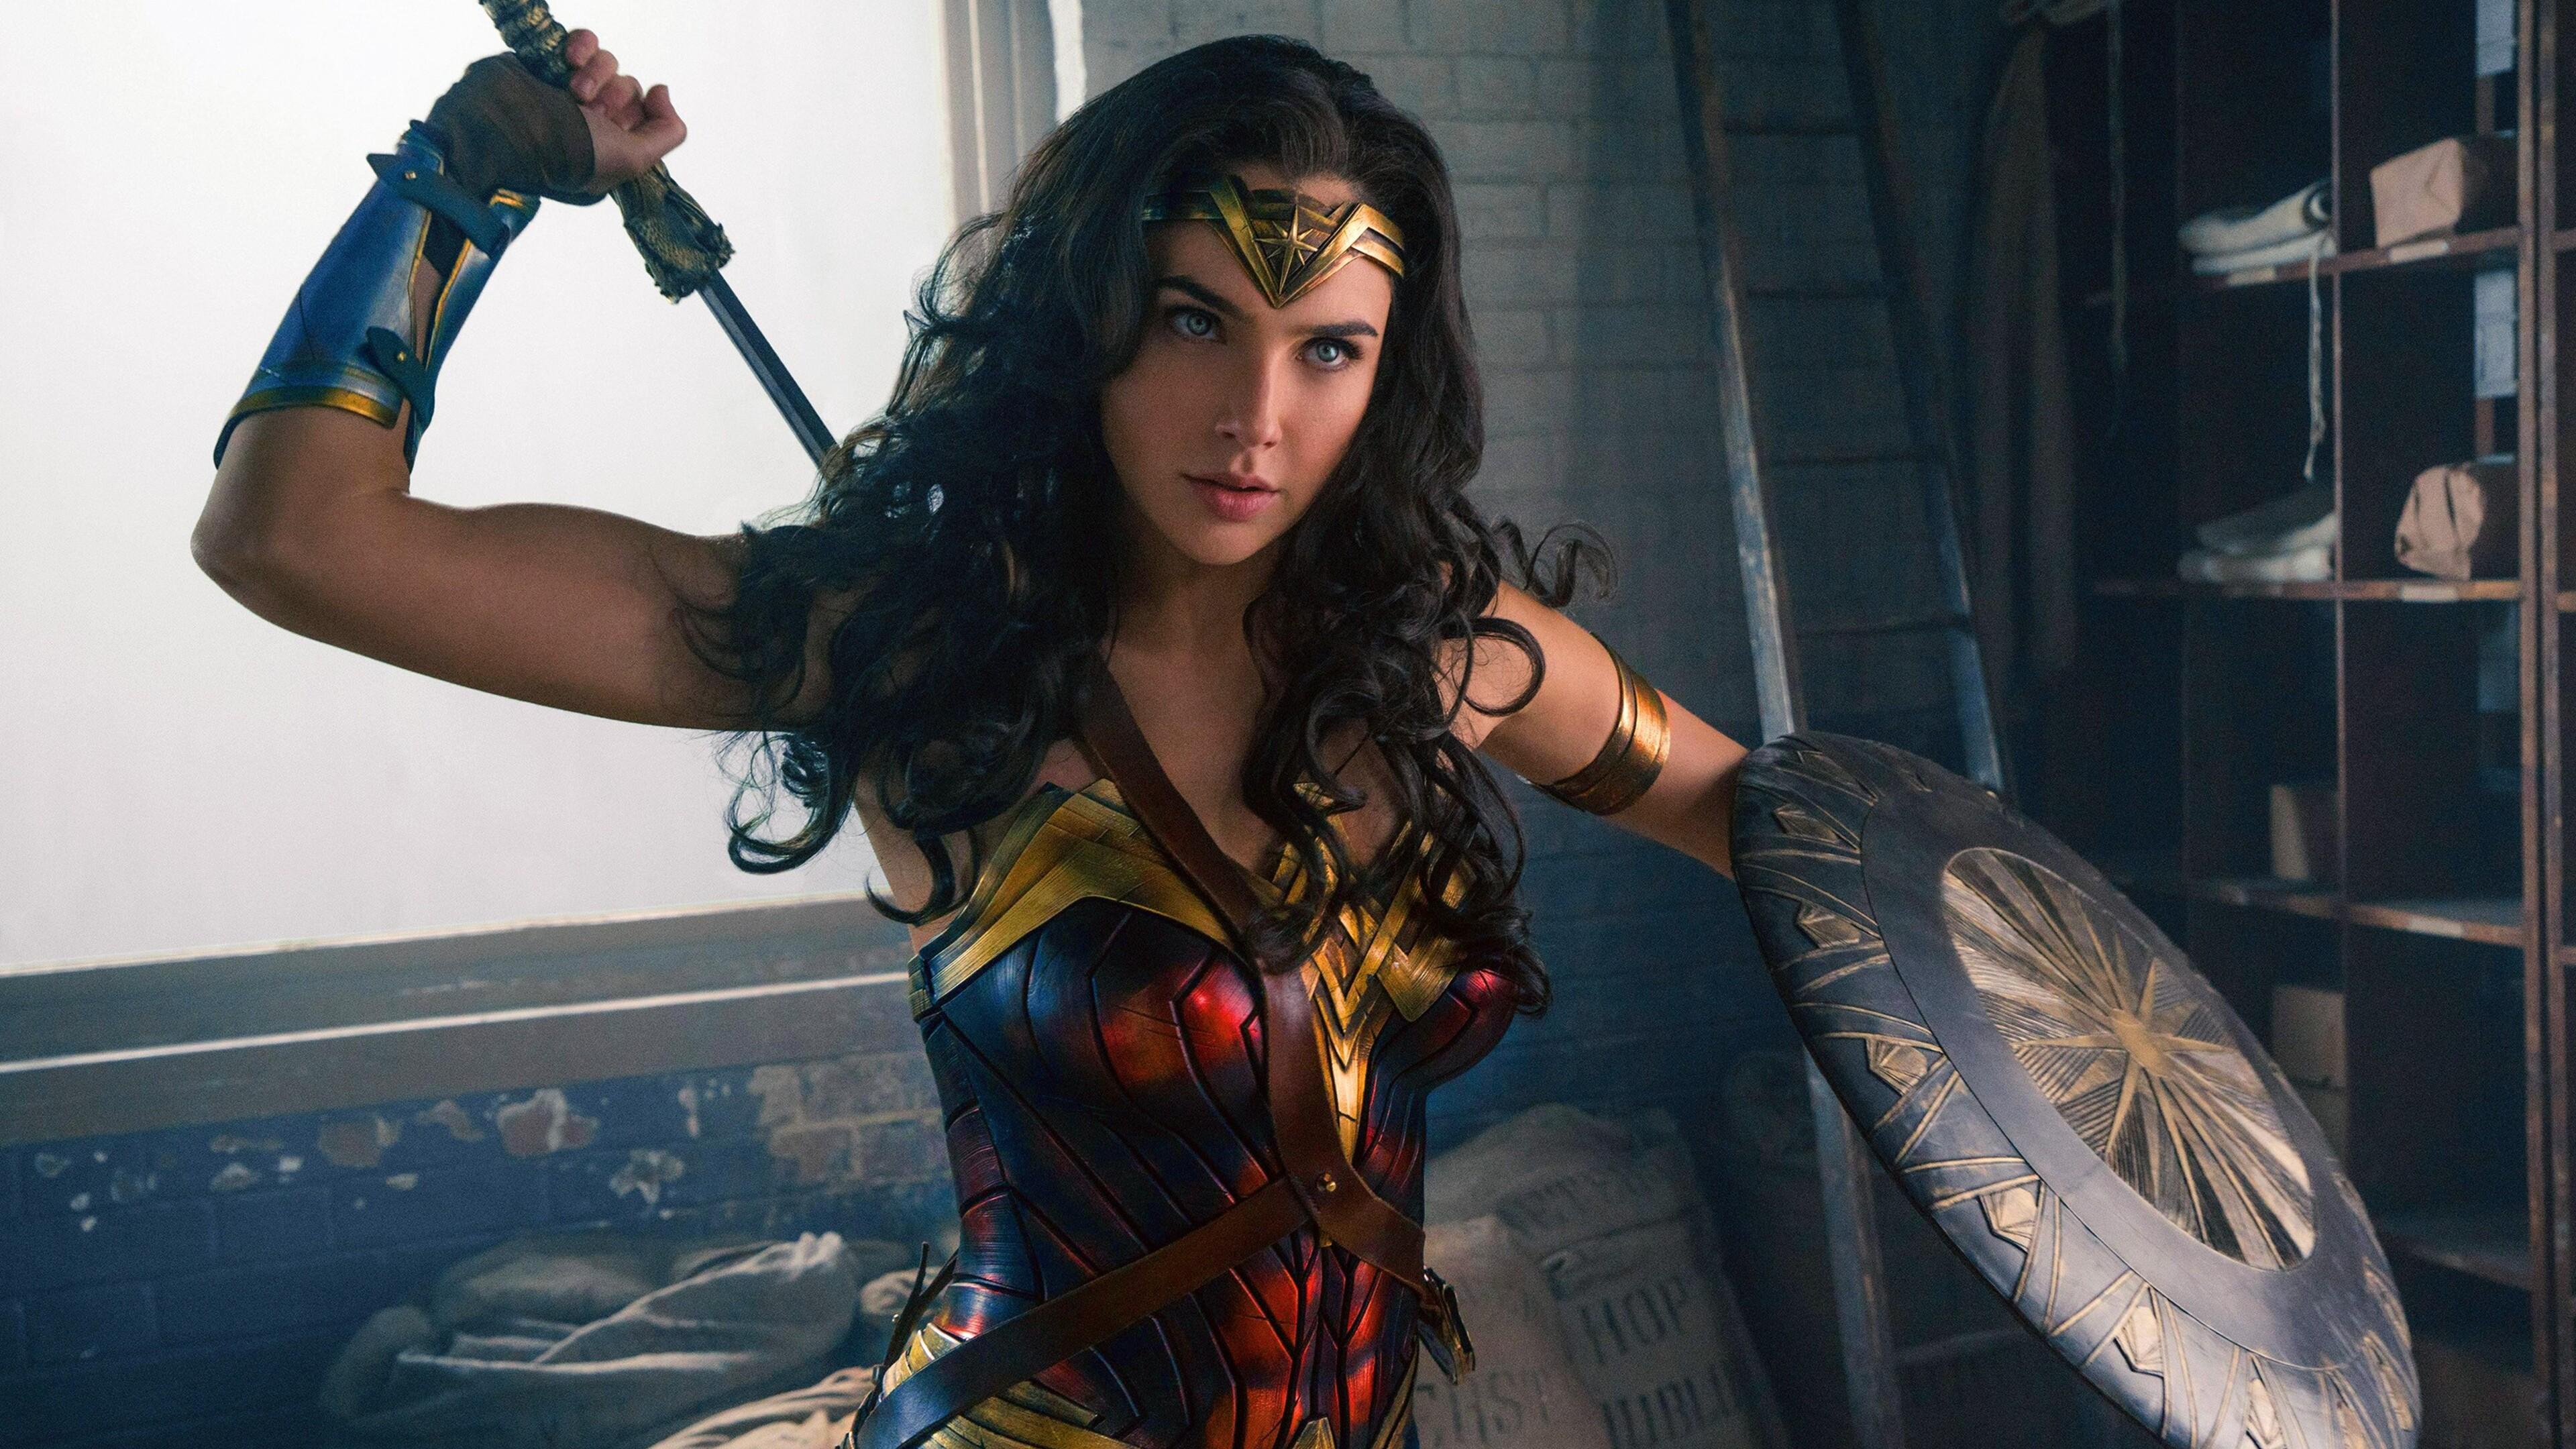 Wallpaper Wonder Woman Hd 4k 8k Movies 9526: 3840x2160 Gal Gadot Wonder Woman 4k HD 4k Wallpapers